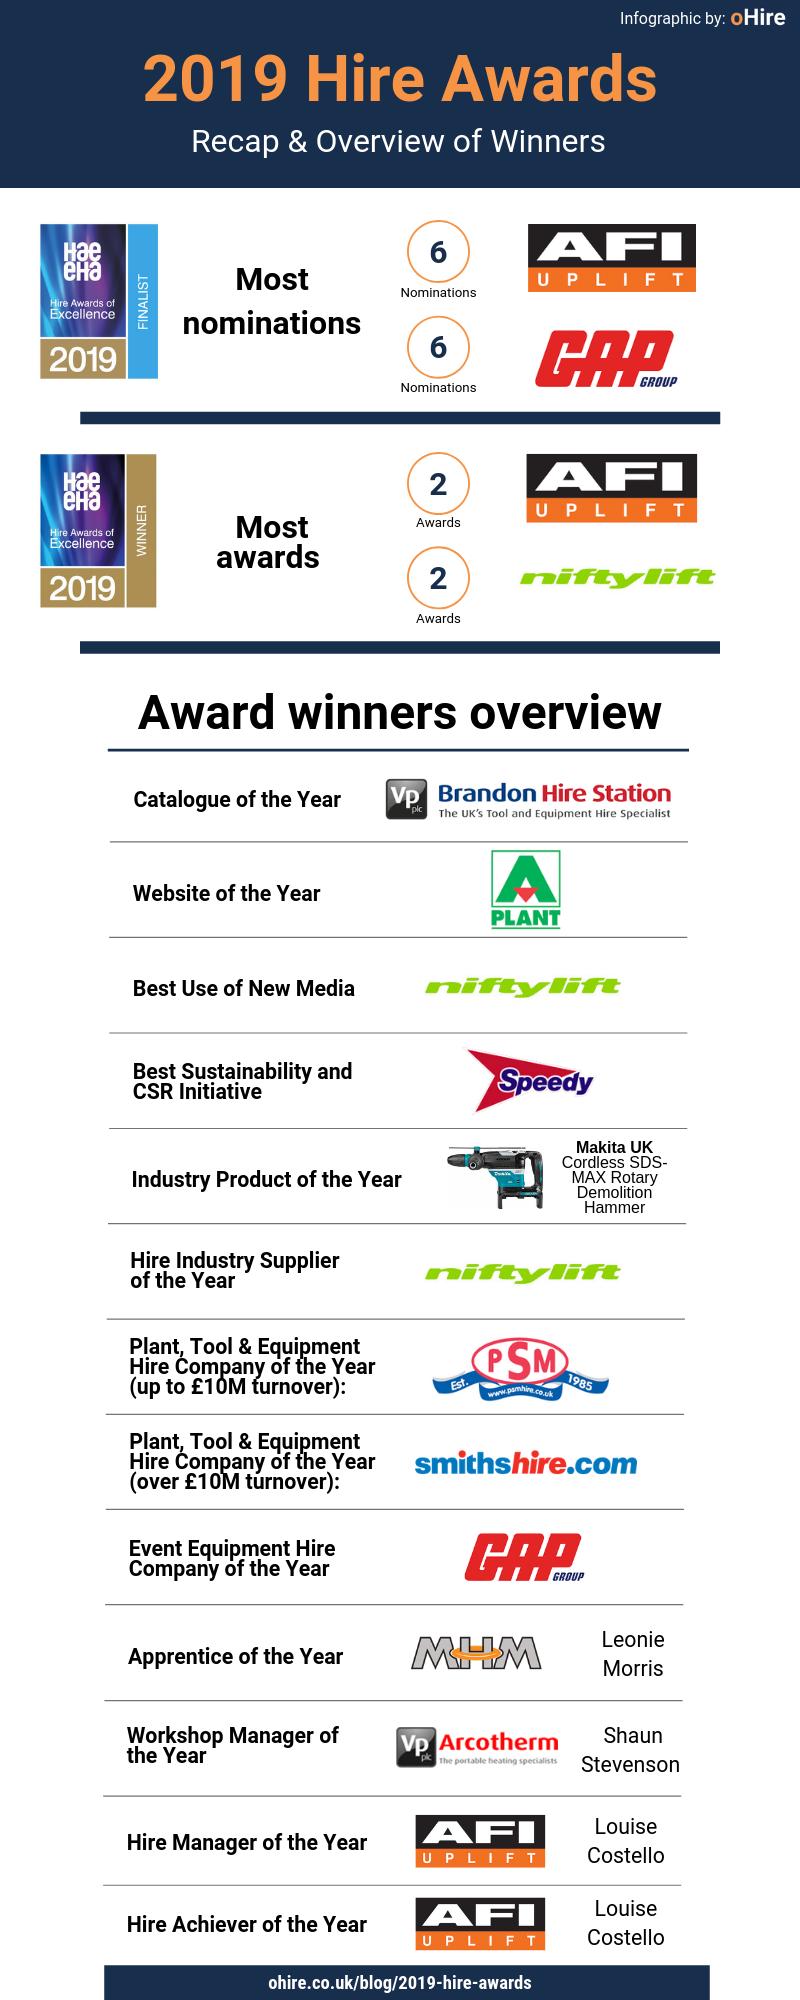 Hire Awards 2019 - recap and winners